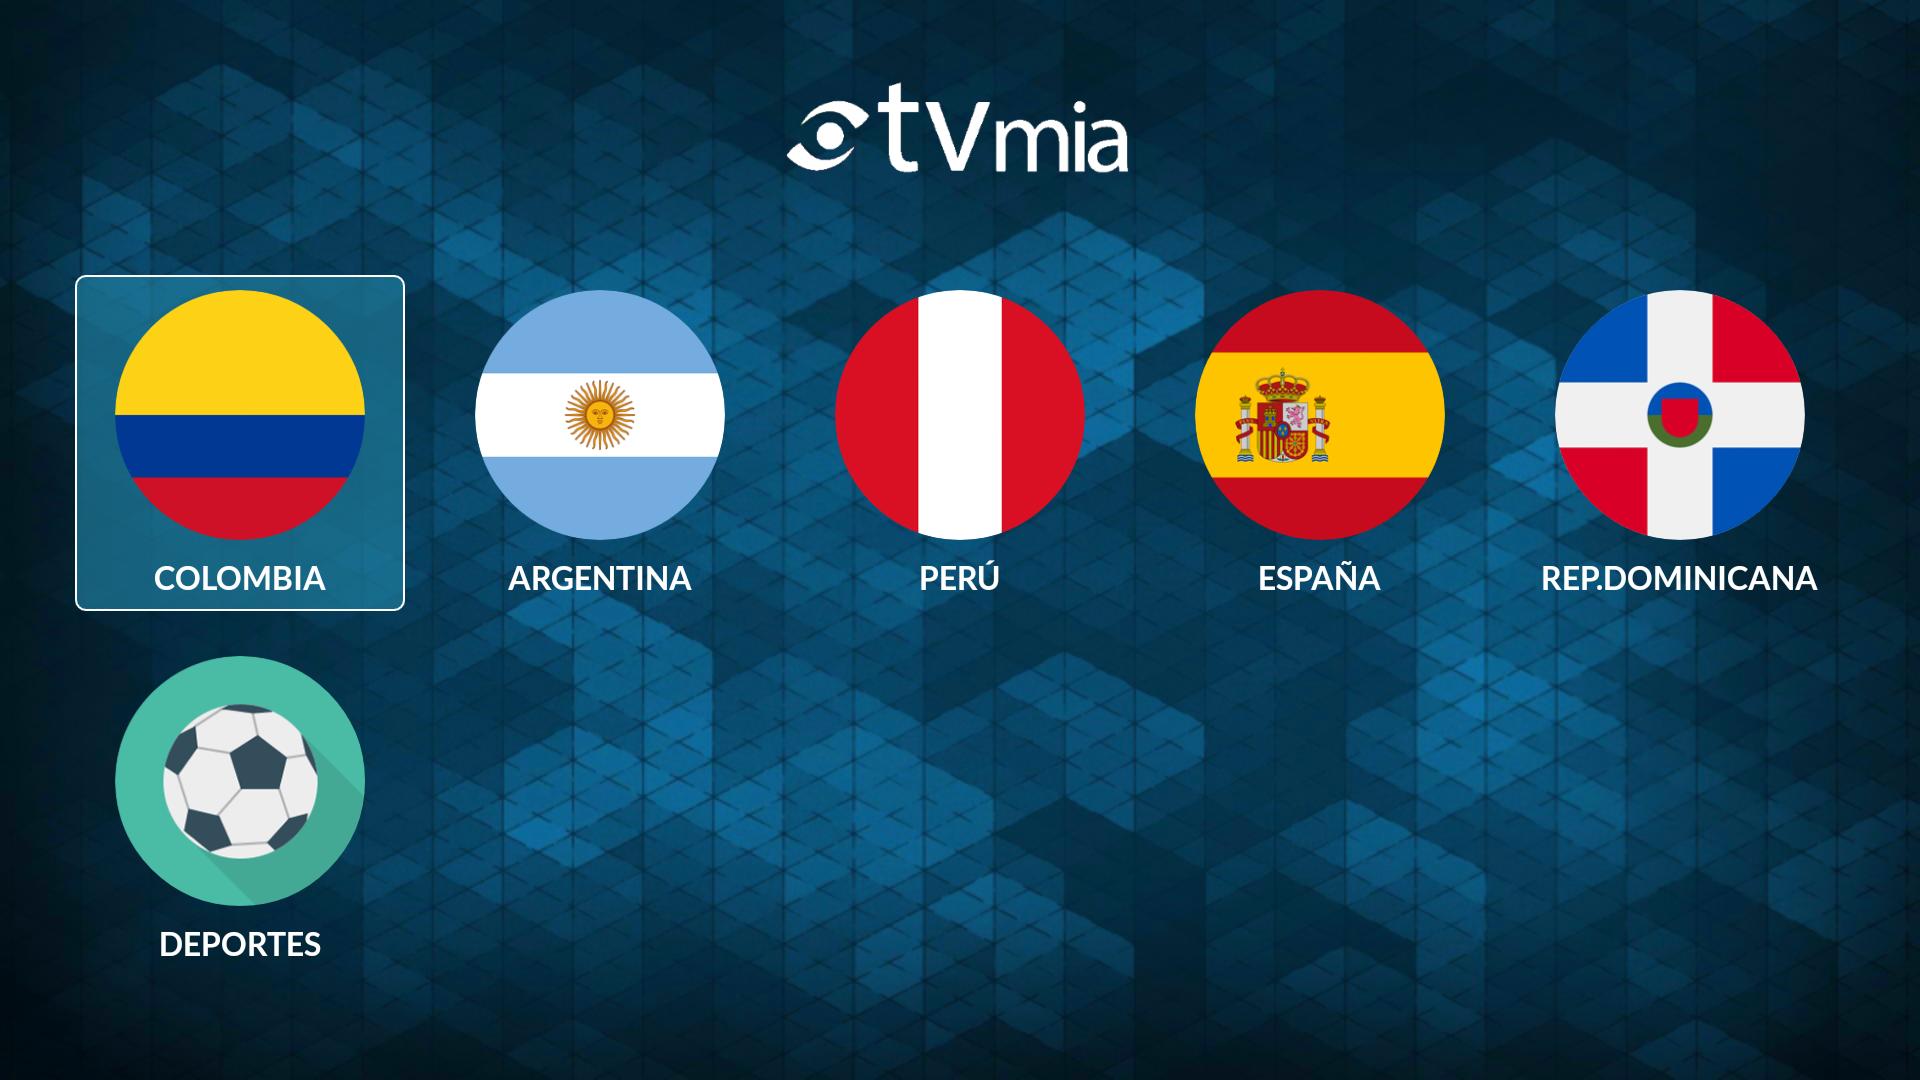 tvmia Colombia: Amazon.es: Appstore para Android